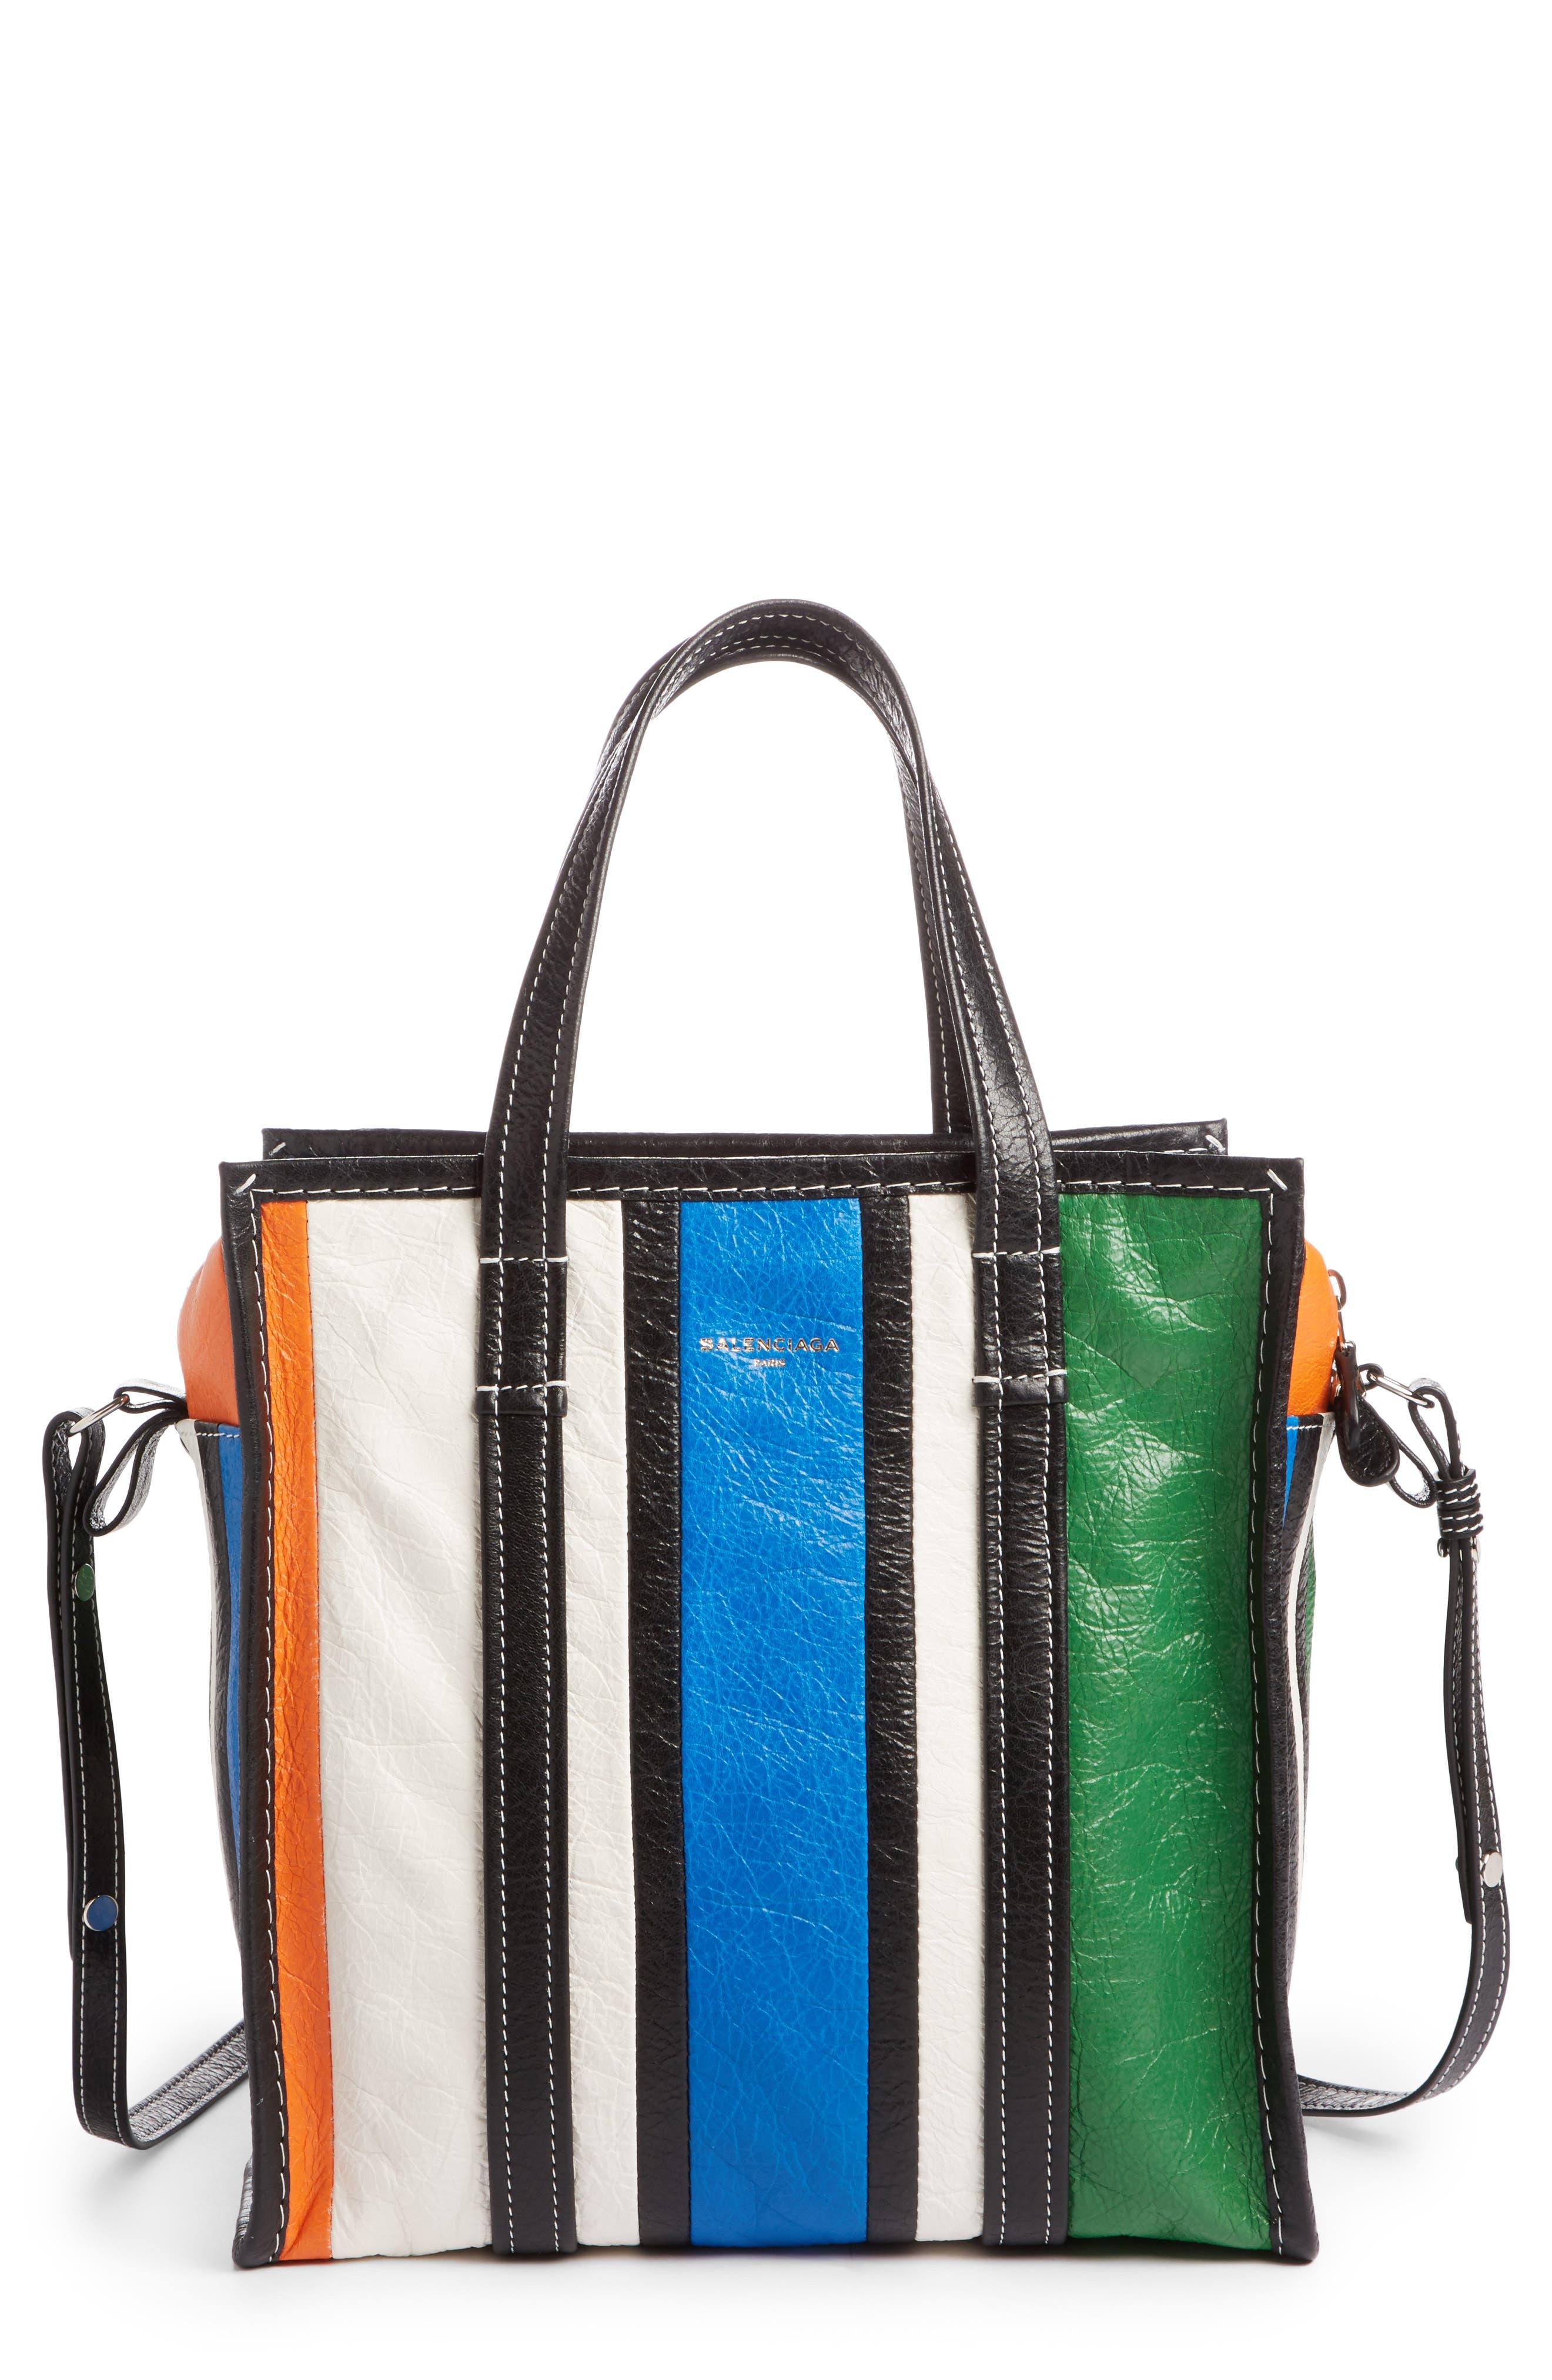 Extra Small Bazar Leather Shopper,                             Main thumbnail 1, color,                             Orange/ Blue/ Vert/ Navy